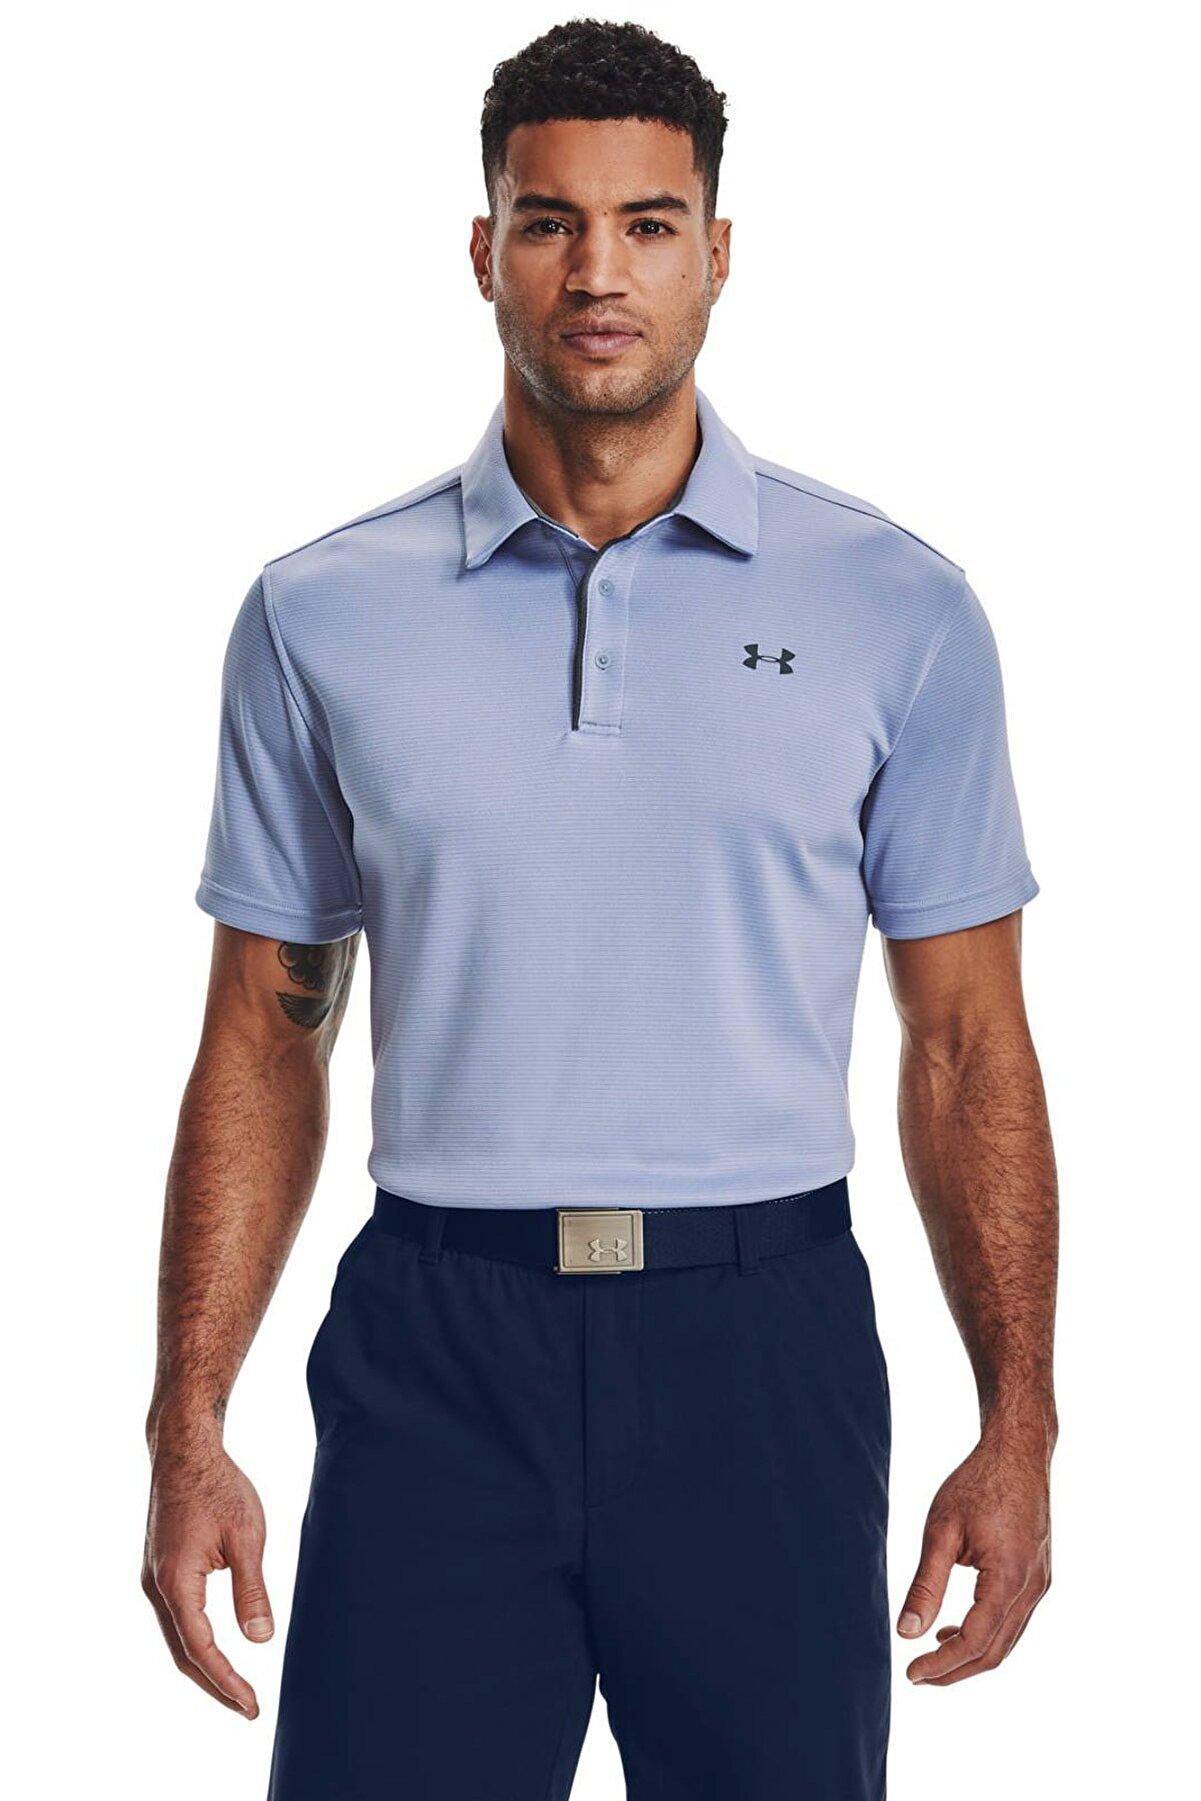 Under Armour Erkek Spor T-Shirt - Tech Polo - 1290140-420